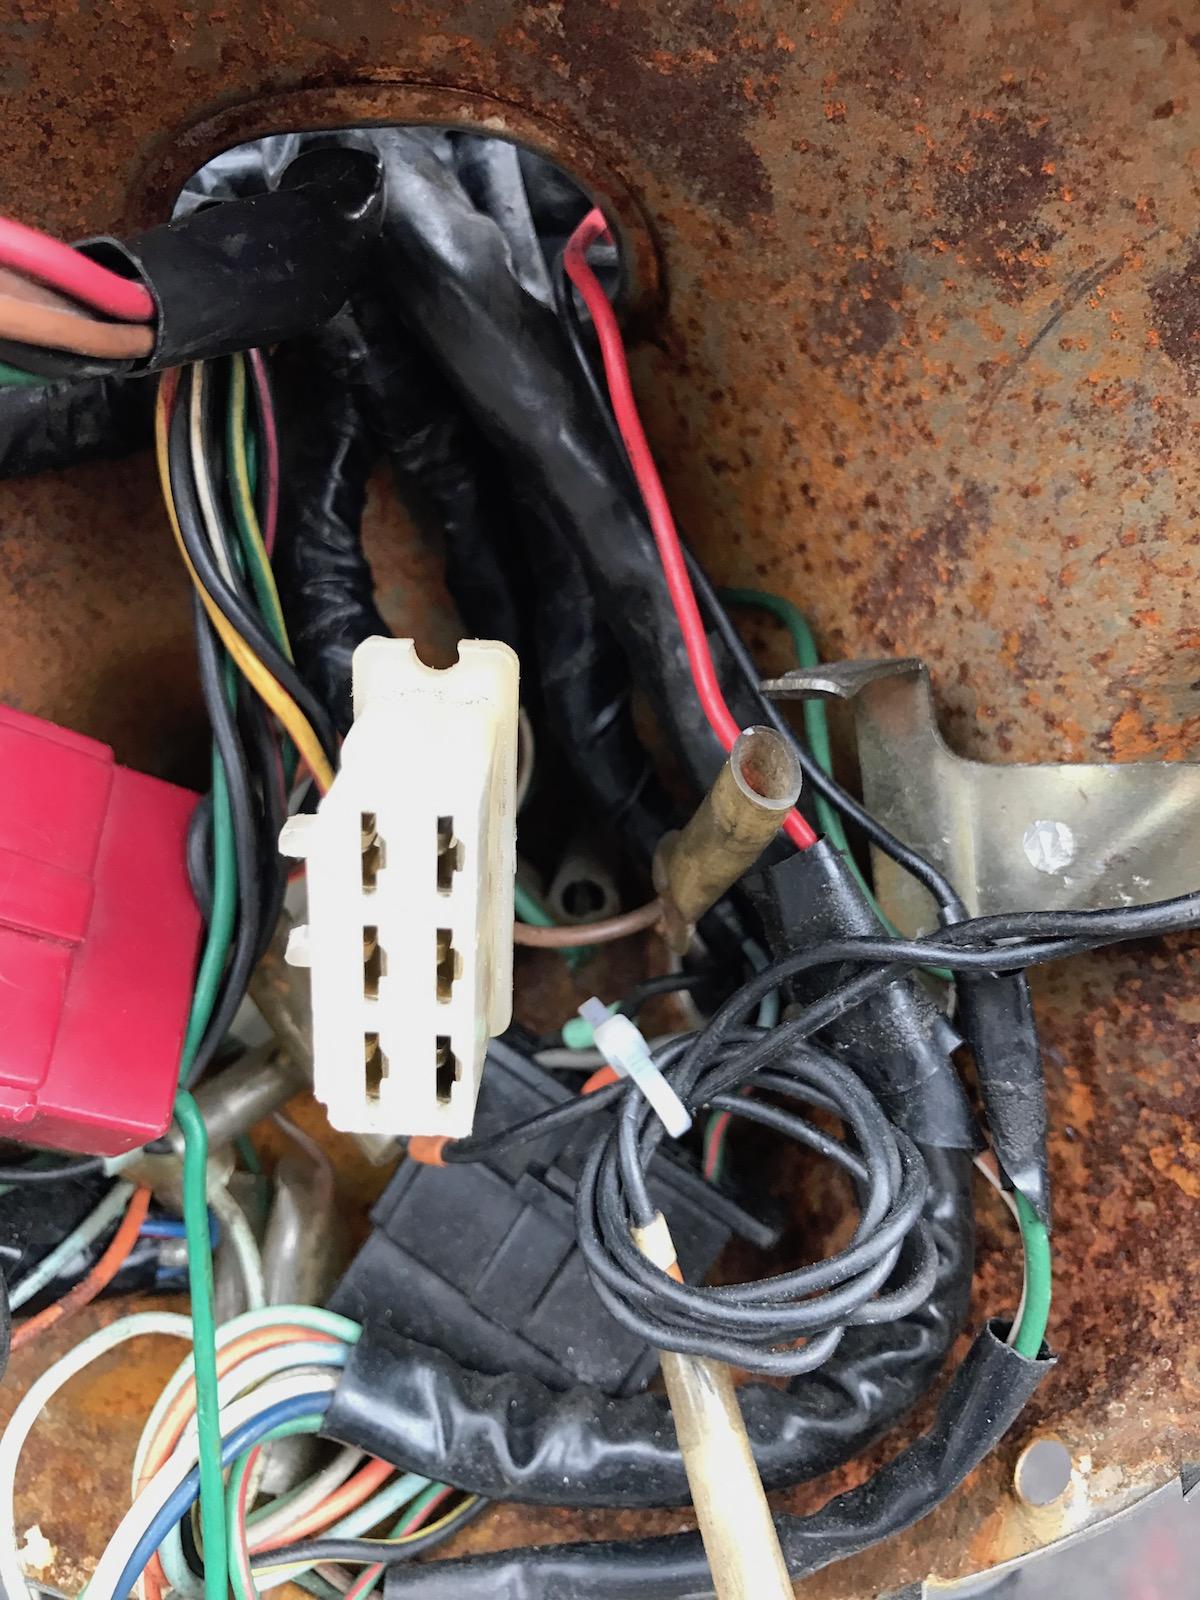 Cm400c Wiring Diagram Schematic Diagrams Electrical Of Honda Cm400a Cm400 Mywheellifecom Yamaha R6 Fuse Box Location Oliver Cb400f Cafe Racer